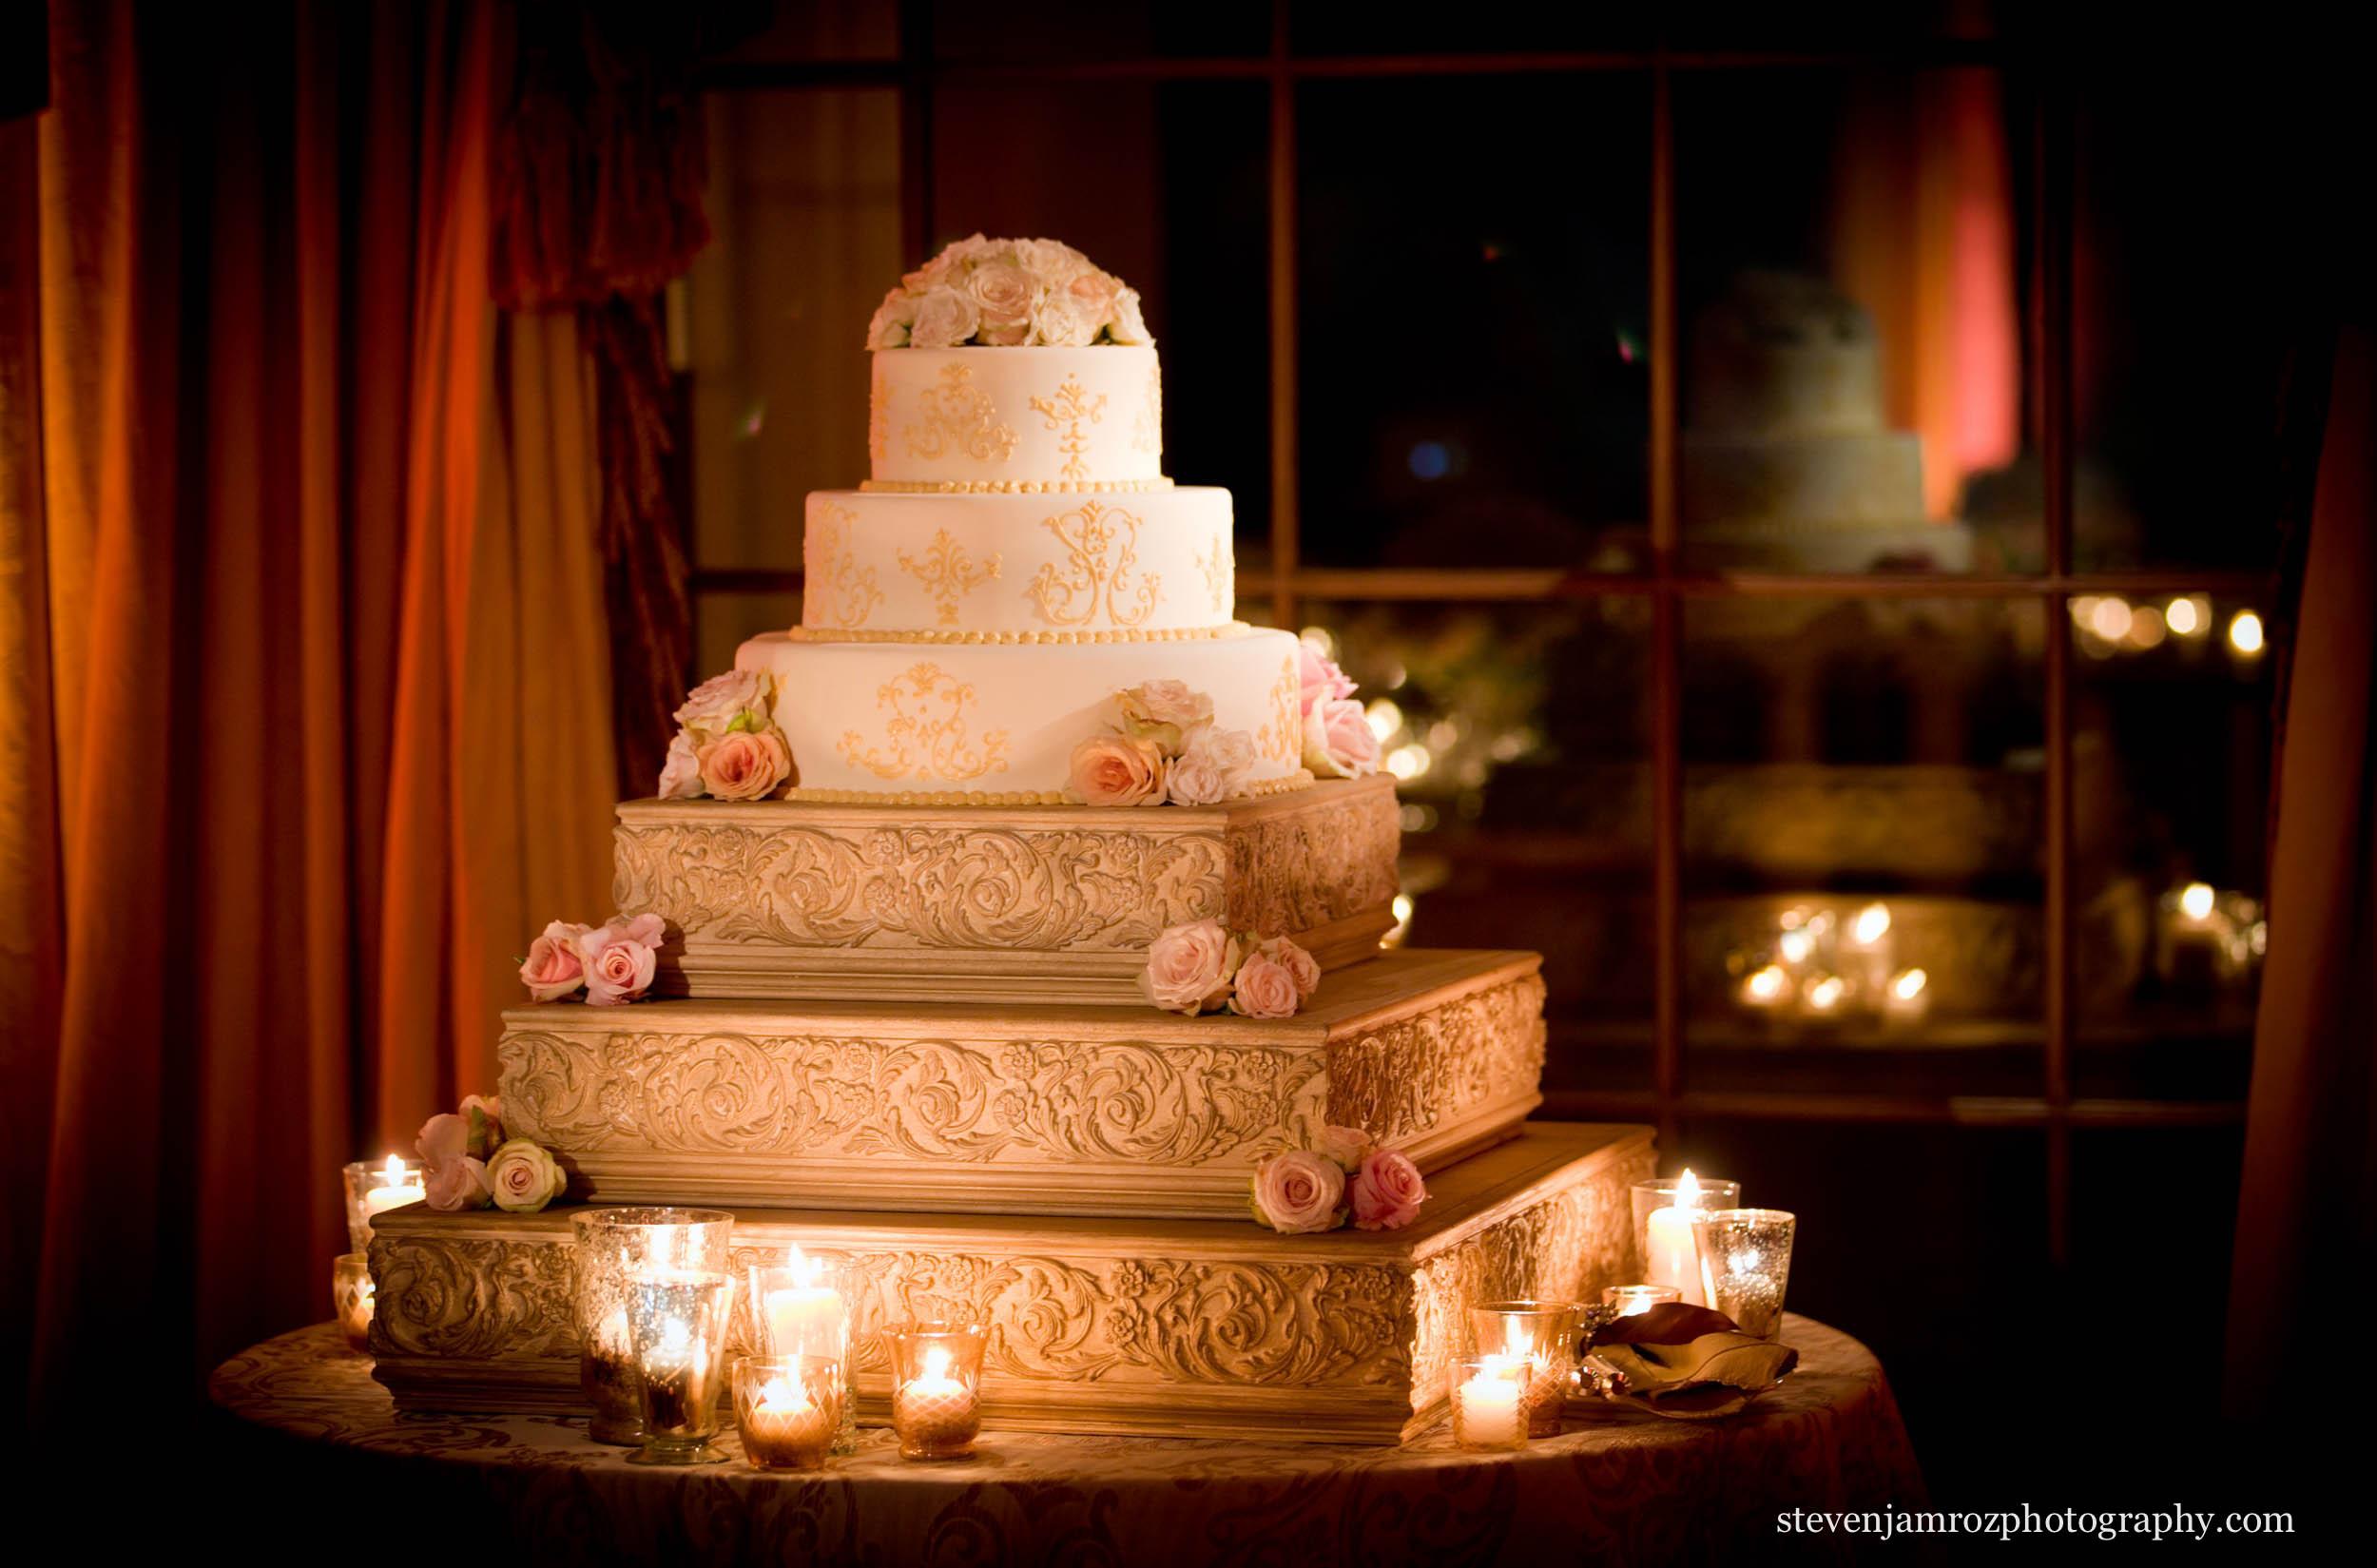 nc-wedding-cake-vendor-review-steven-jamroz-photography-0563.jpg